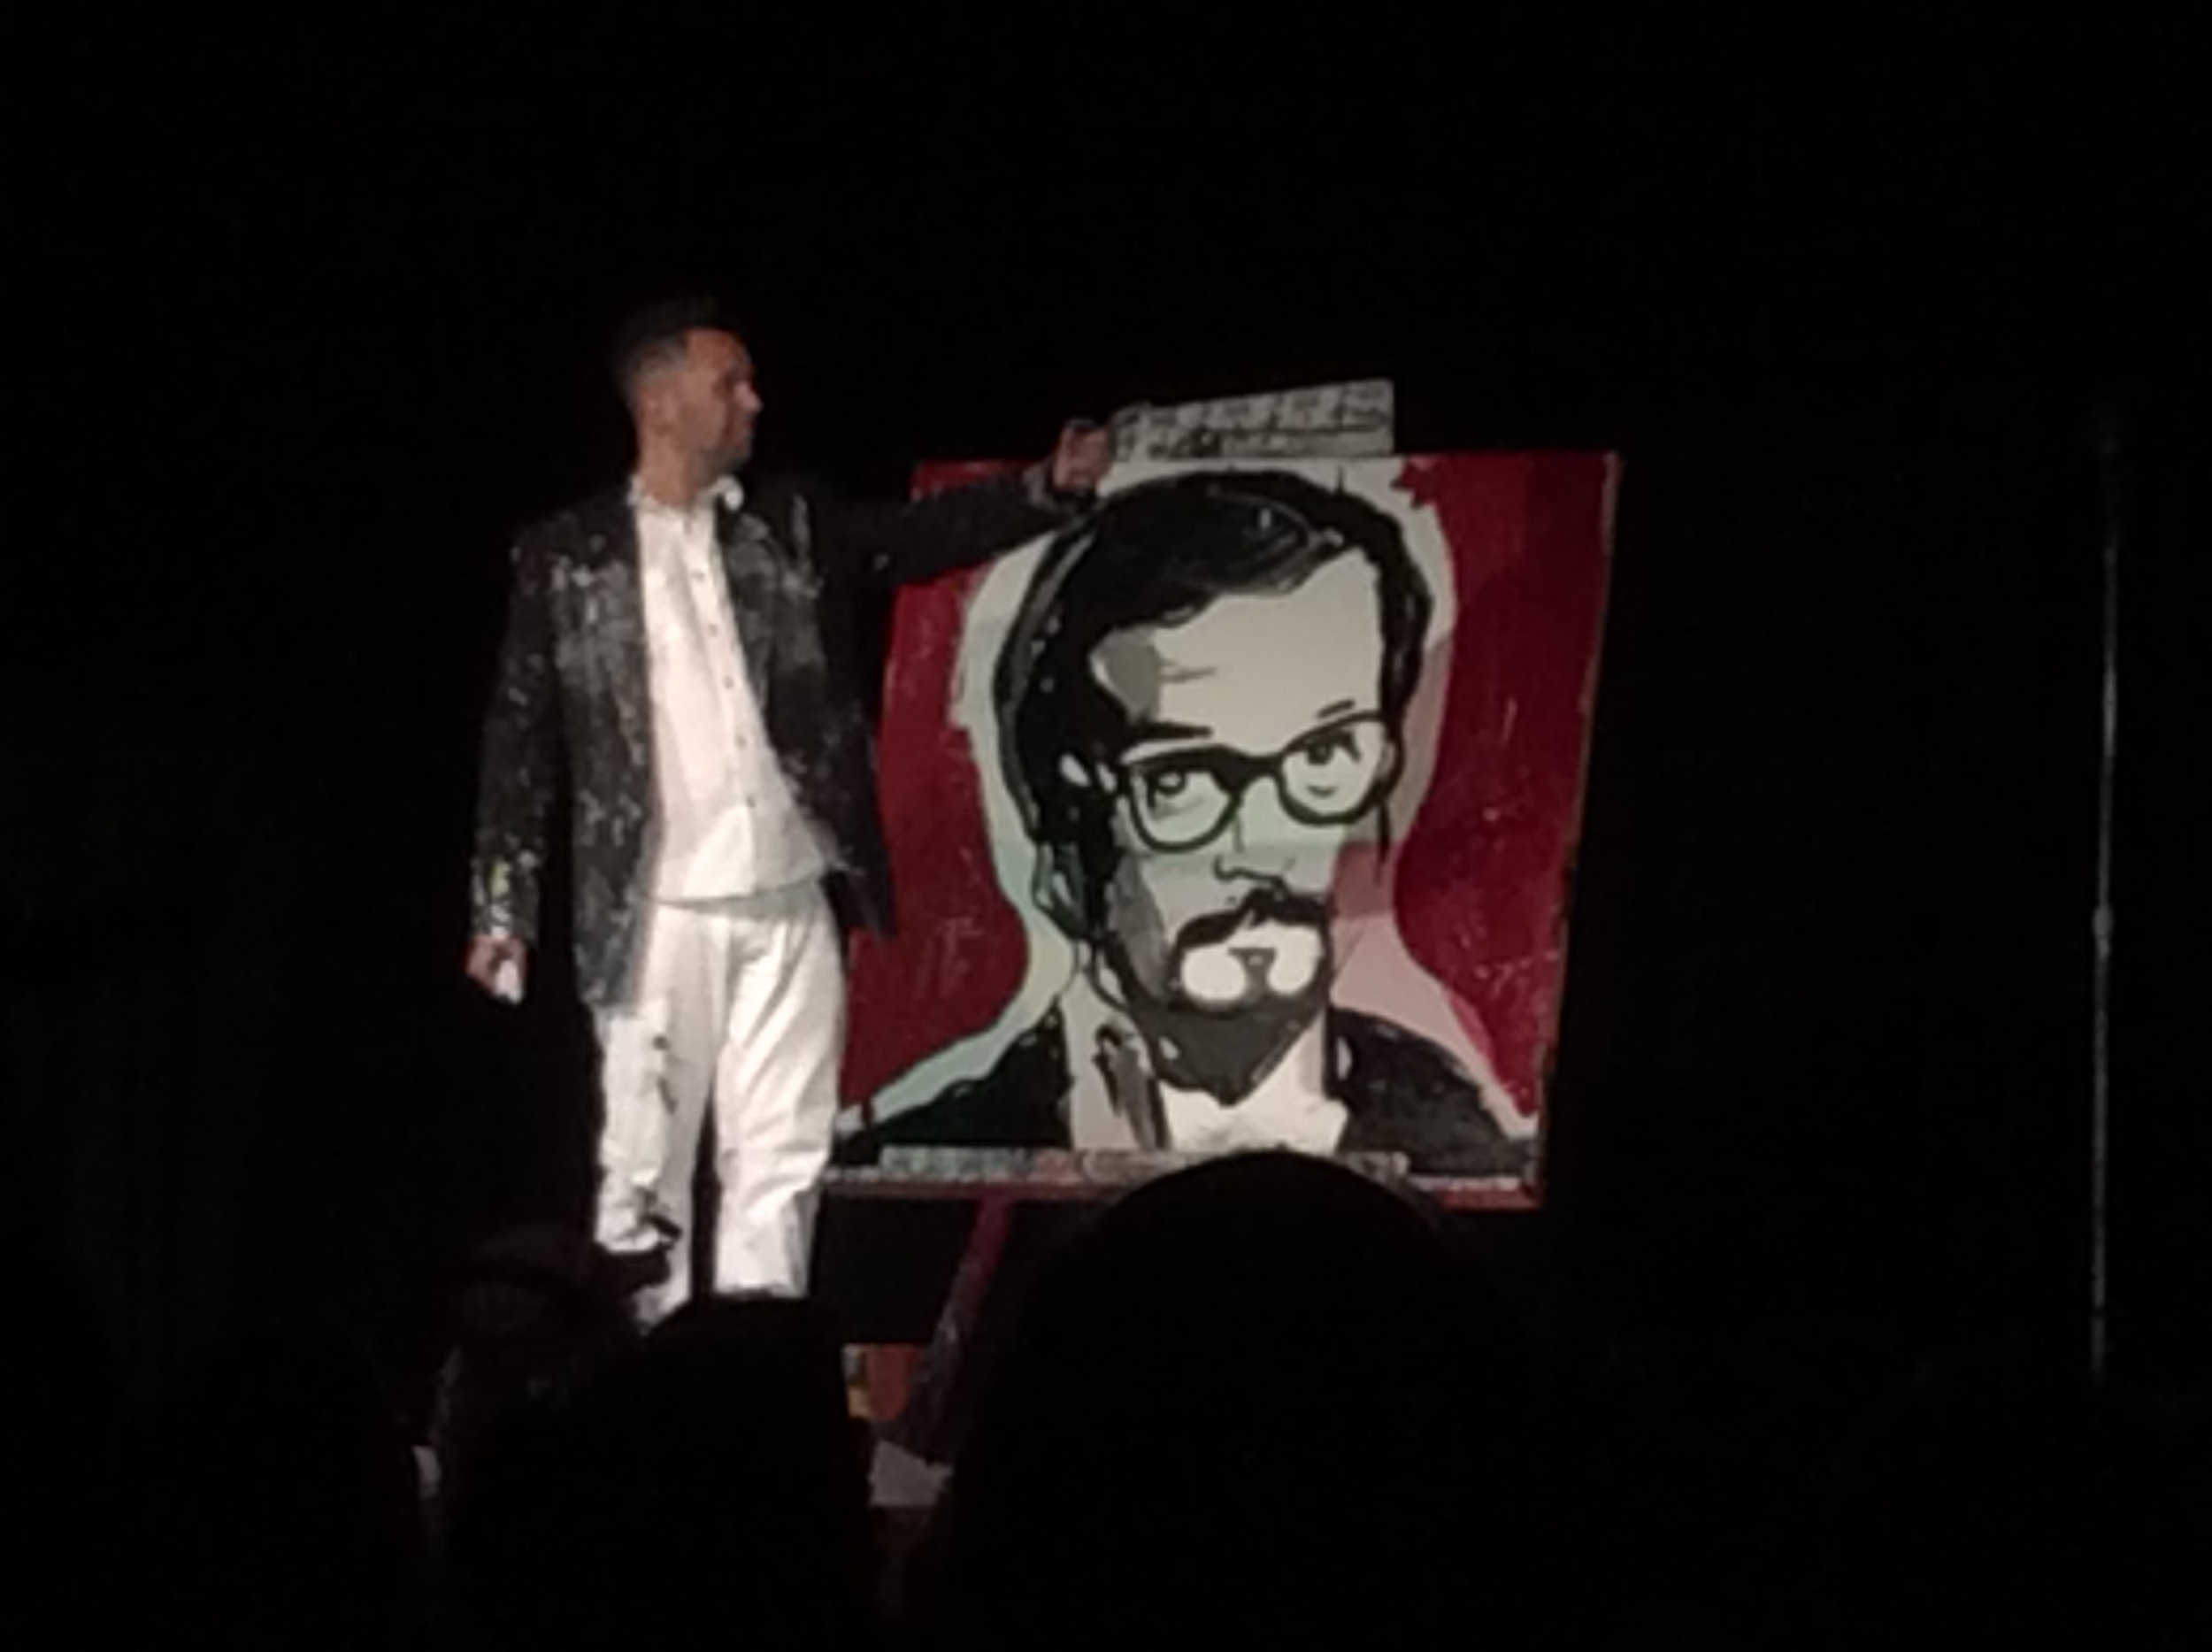 John Jansky paints a portrait of Harry Blackstone, Jr.